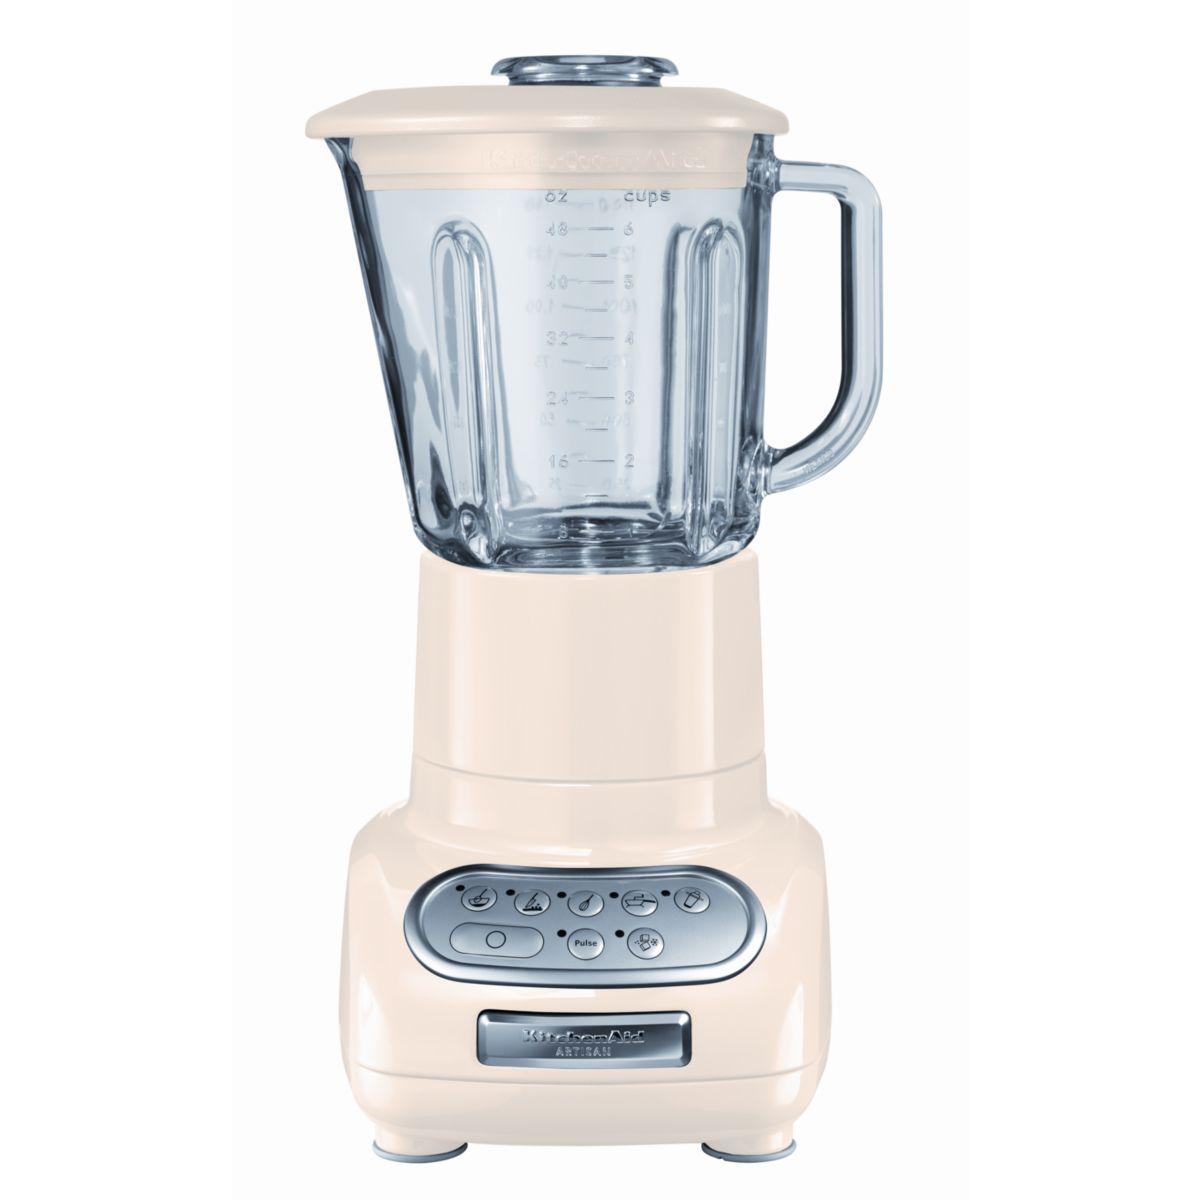 Blender kitchenaid 5ksb5553 eac creme artisan - livraison offerte : code livprem